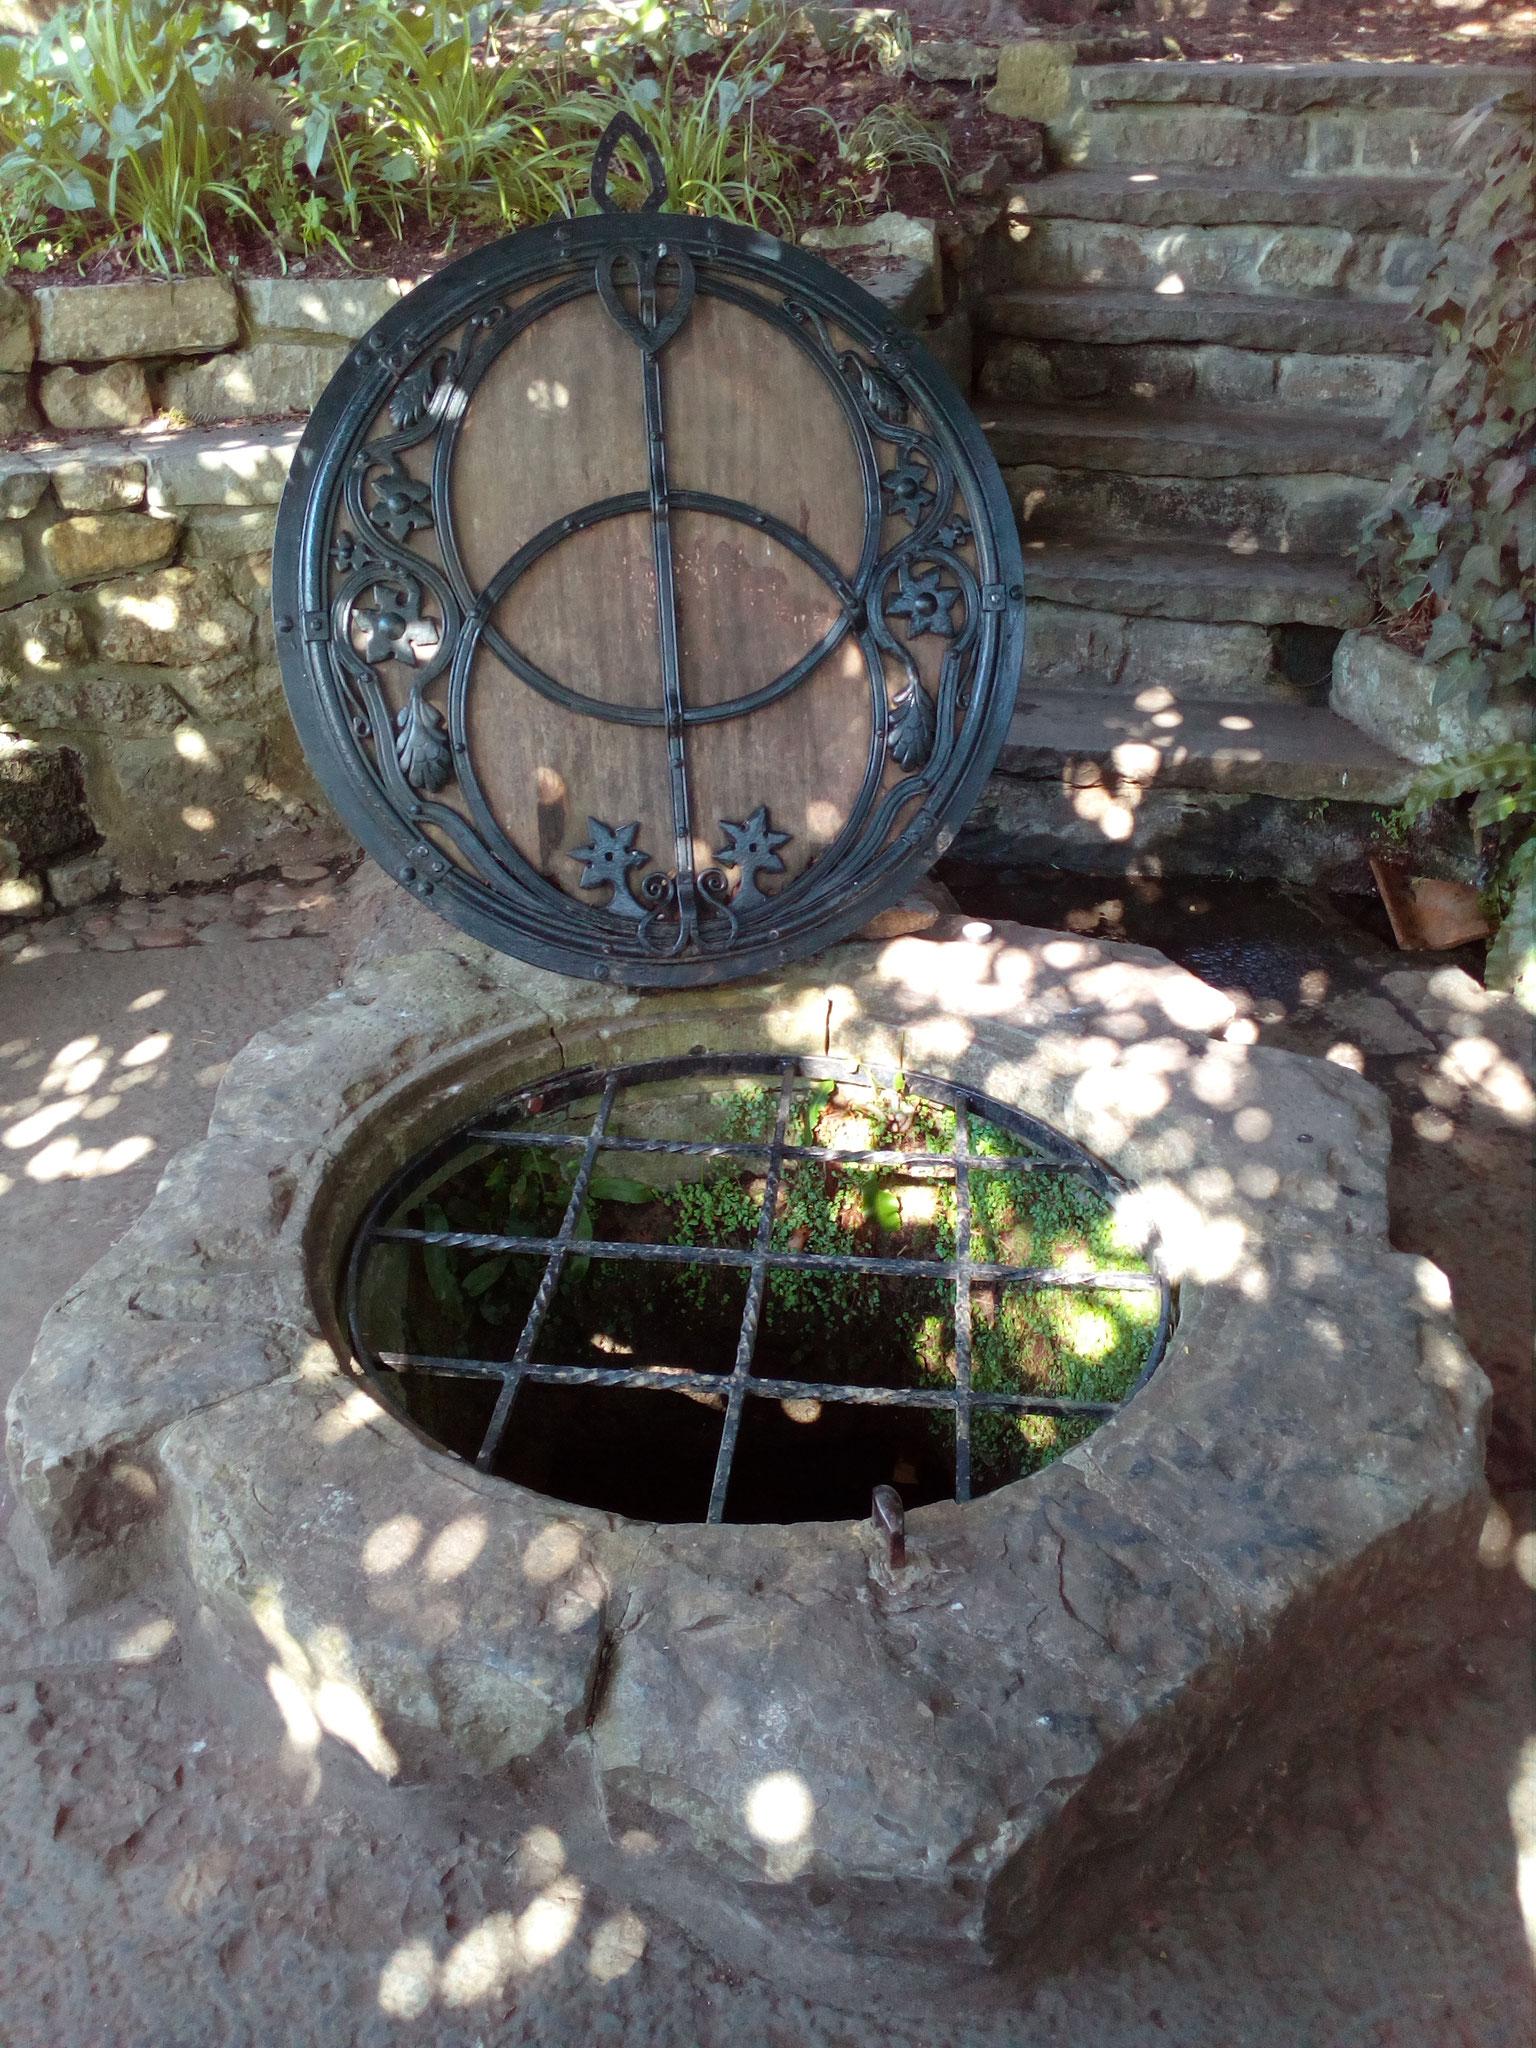 The Well Head mit dem Vesica Piscis Symbol